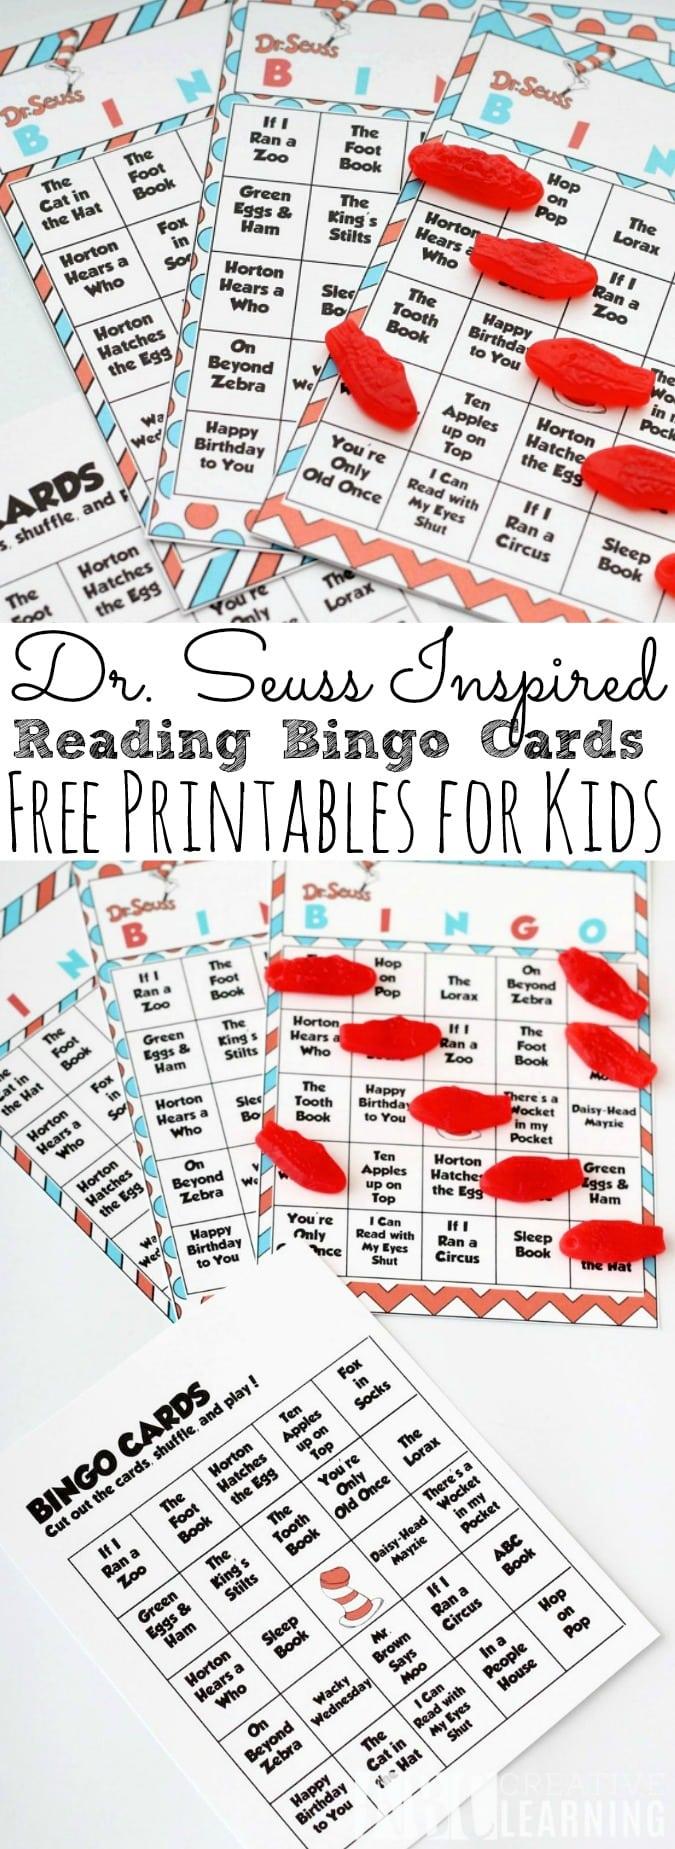 Dr. Seuss Bingo Cards